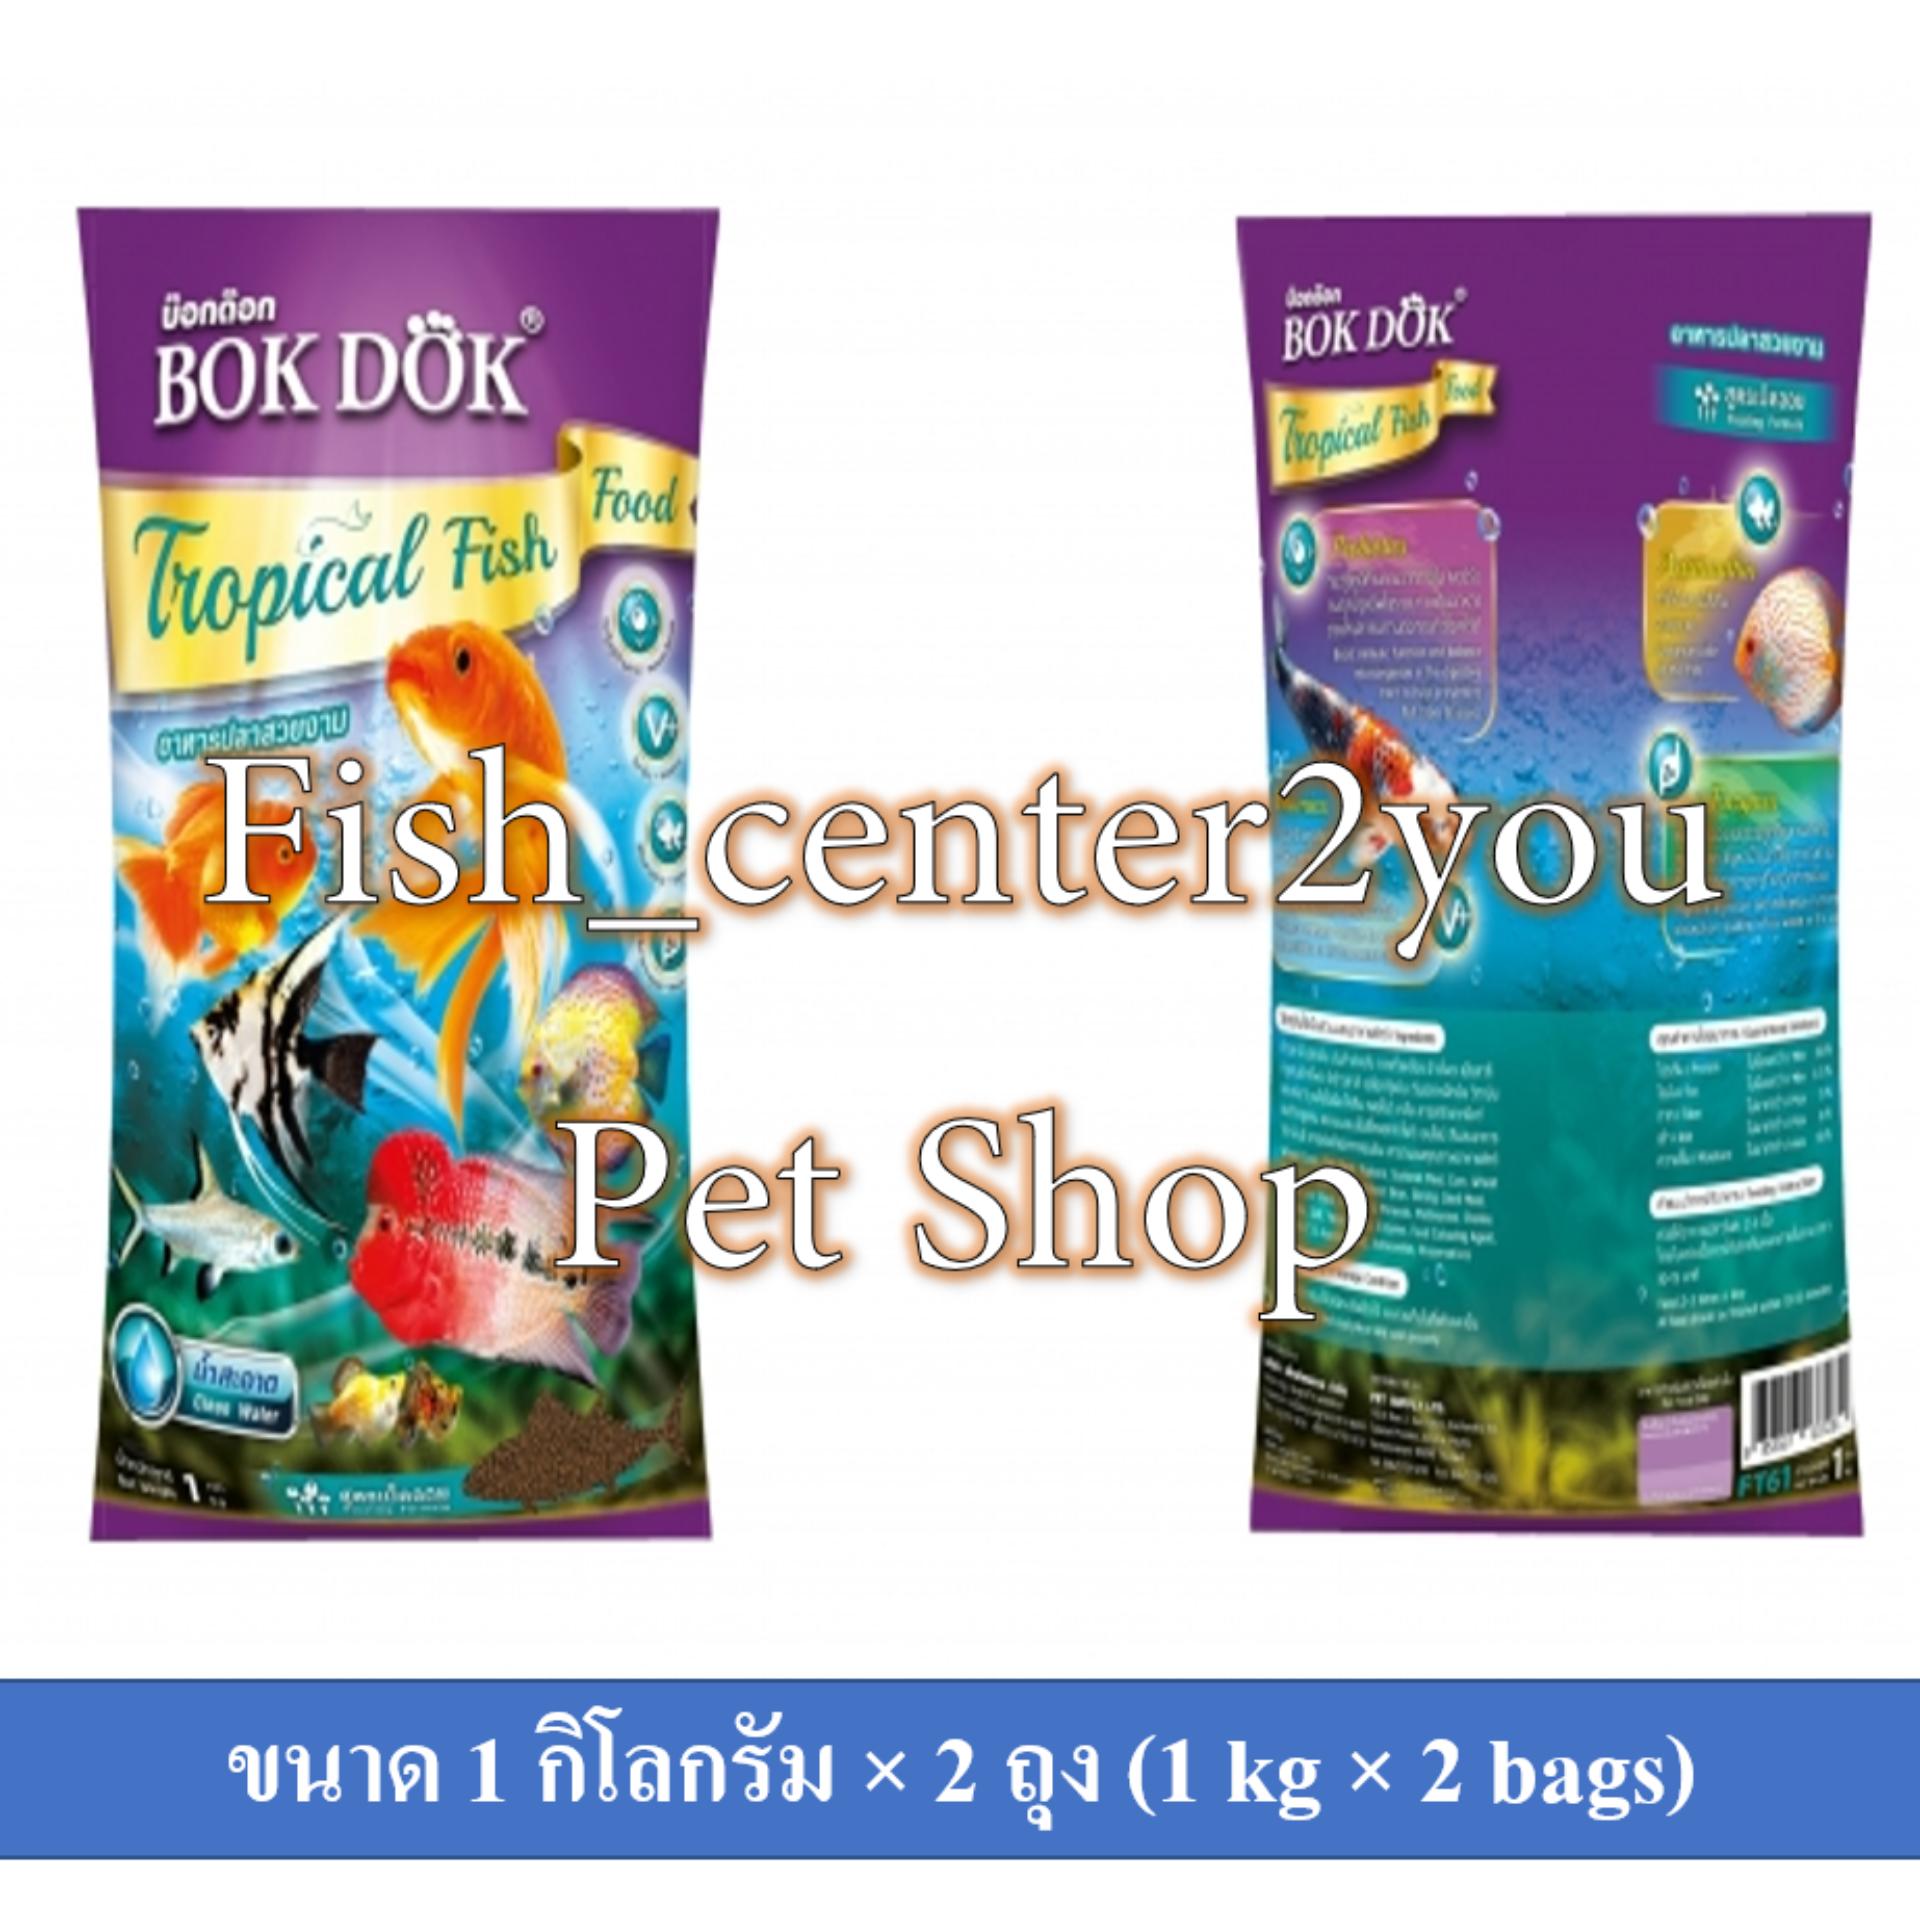 Bok Dok tropical fish อาหารปลา สวยงาม 1kg.  จำนวน 2ถุง